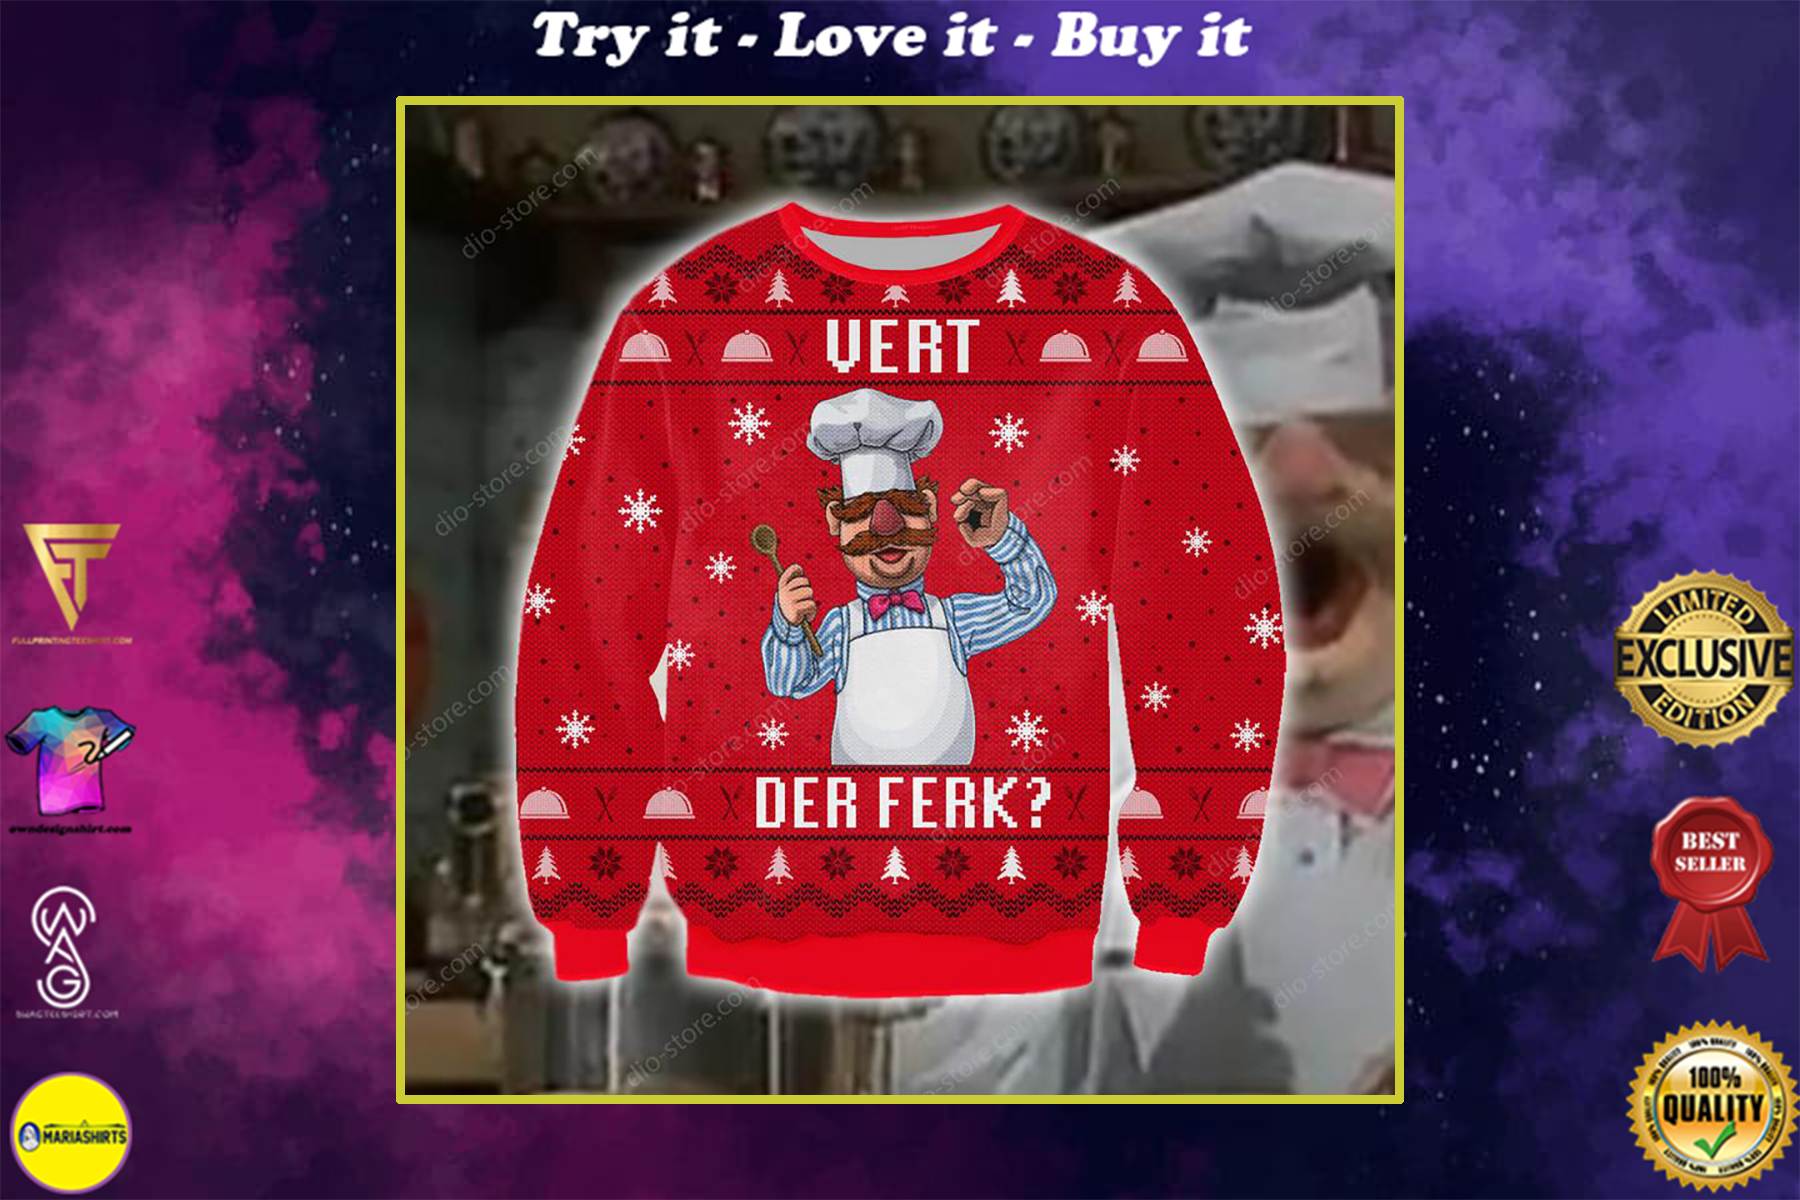 chef vert der ferk all over printed ugly christmas sweater